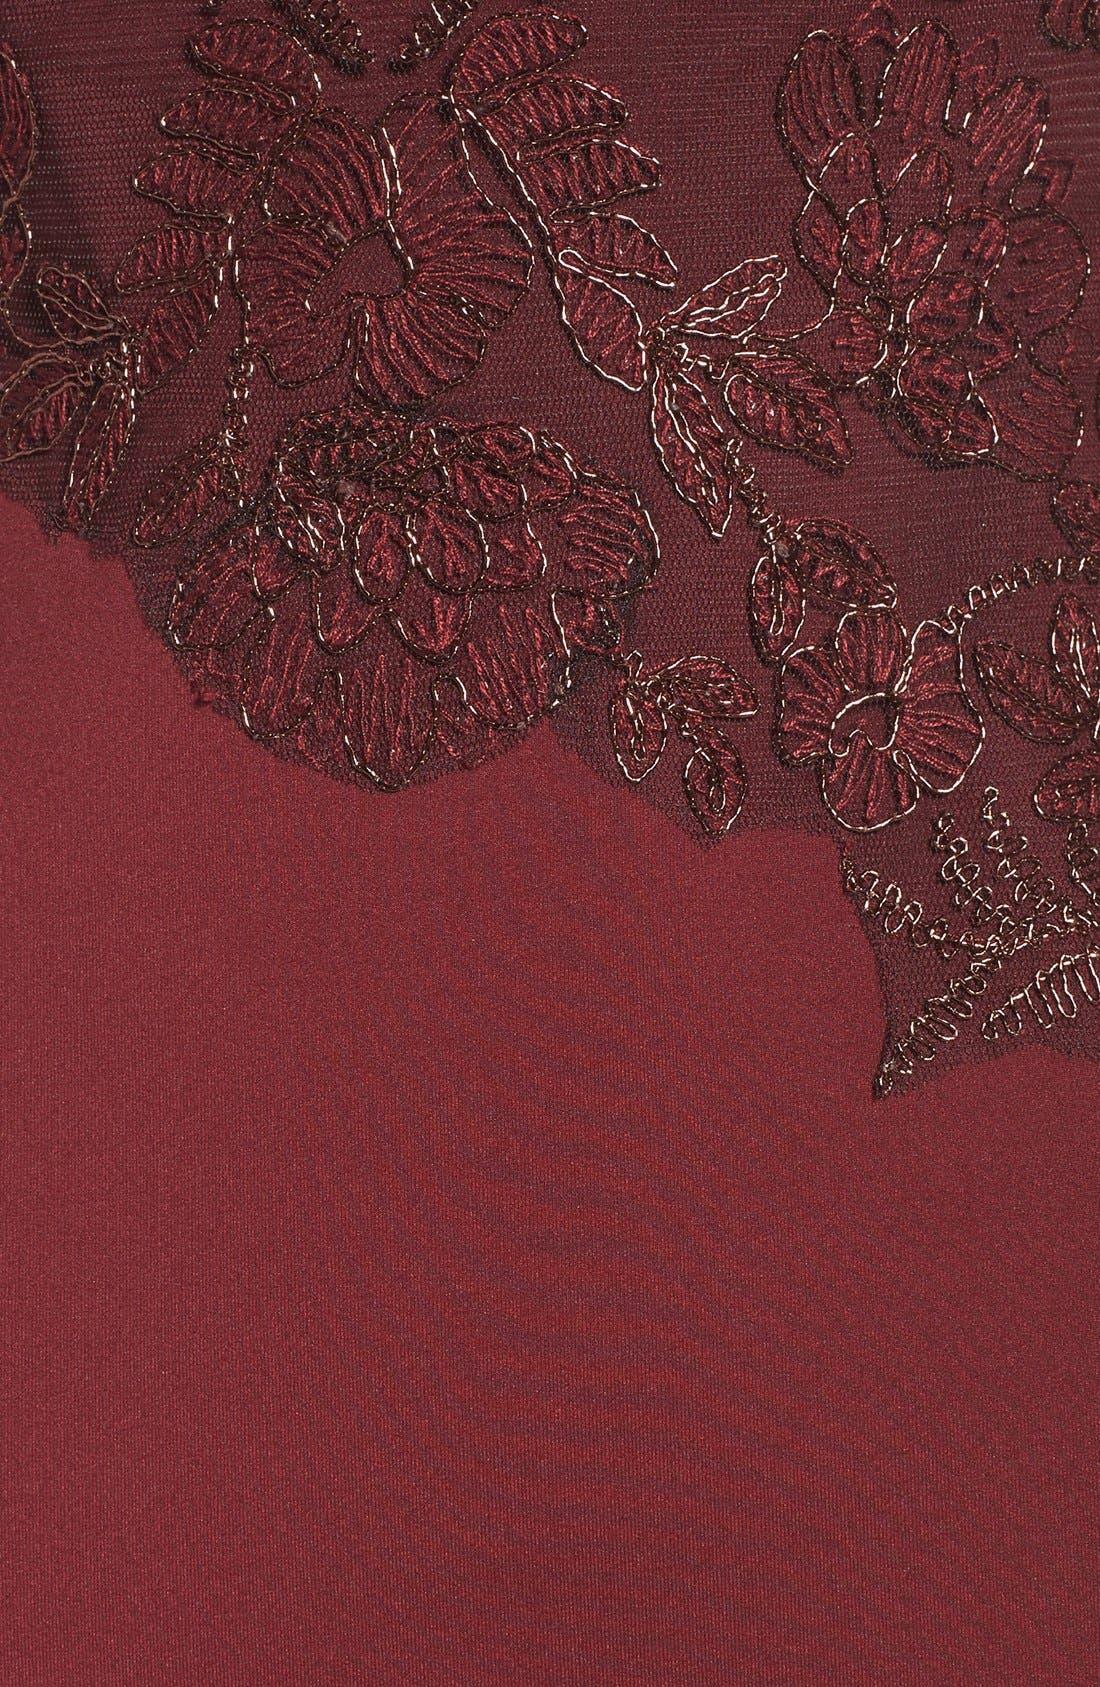 Lace Sheath Dress,                             Alternate thumbnail 12, color,